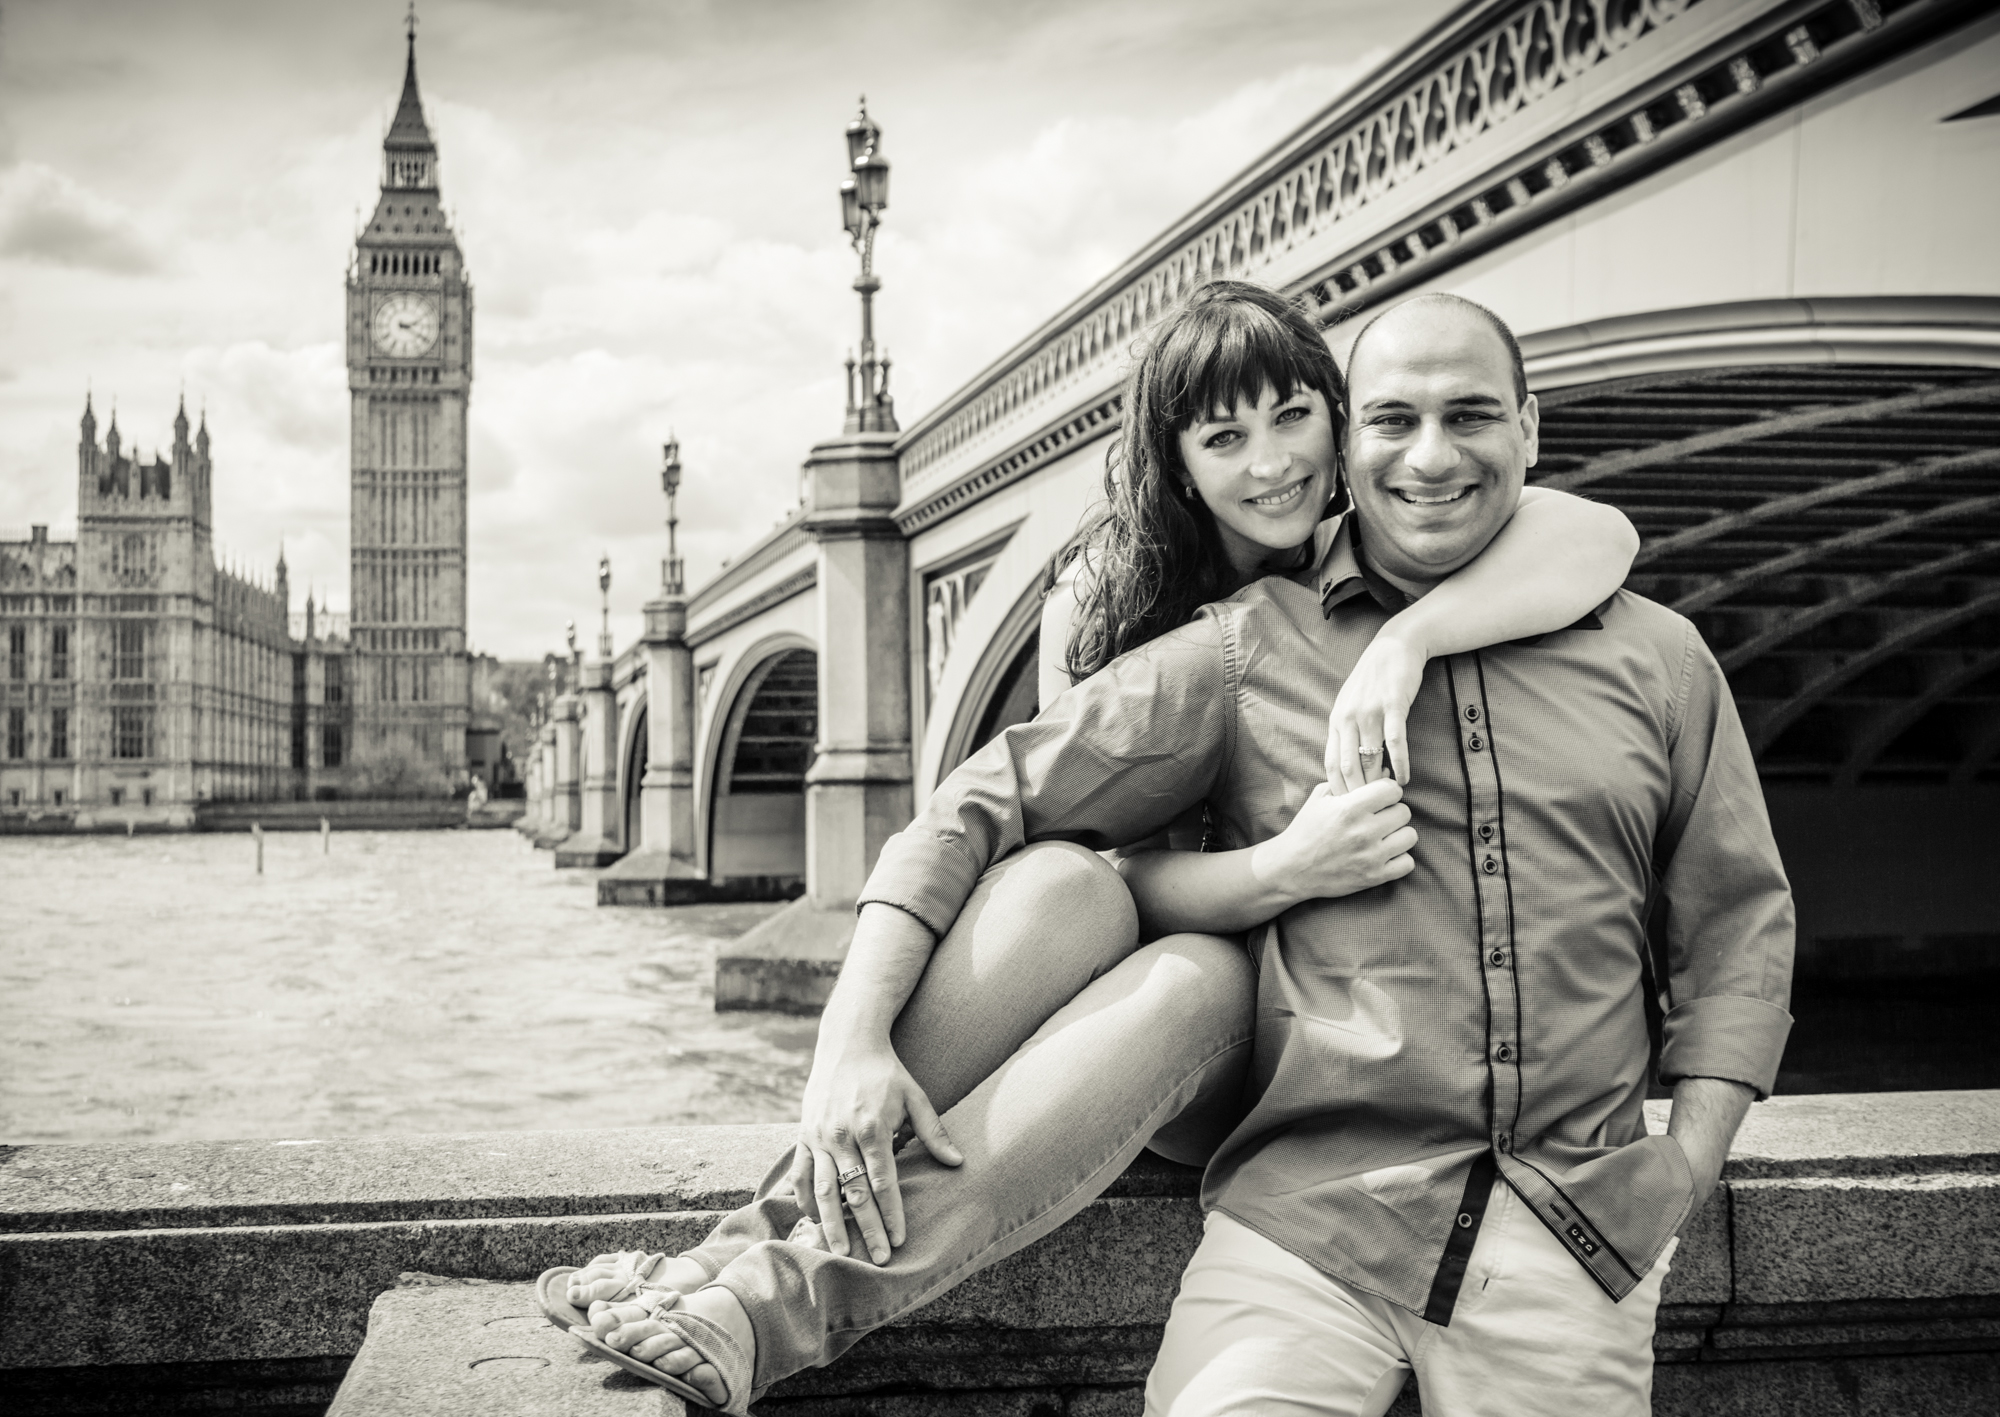 London sightseers photography